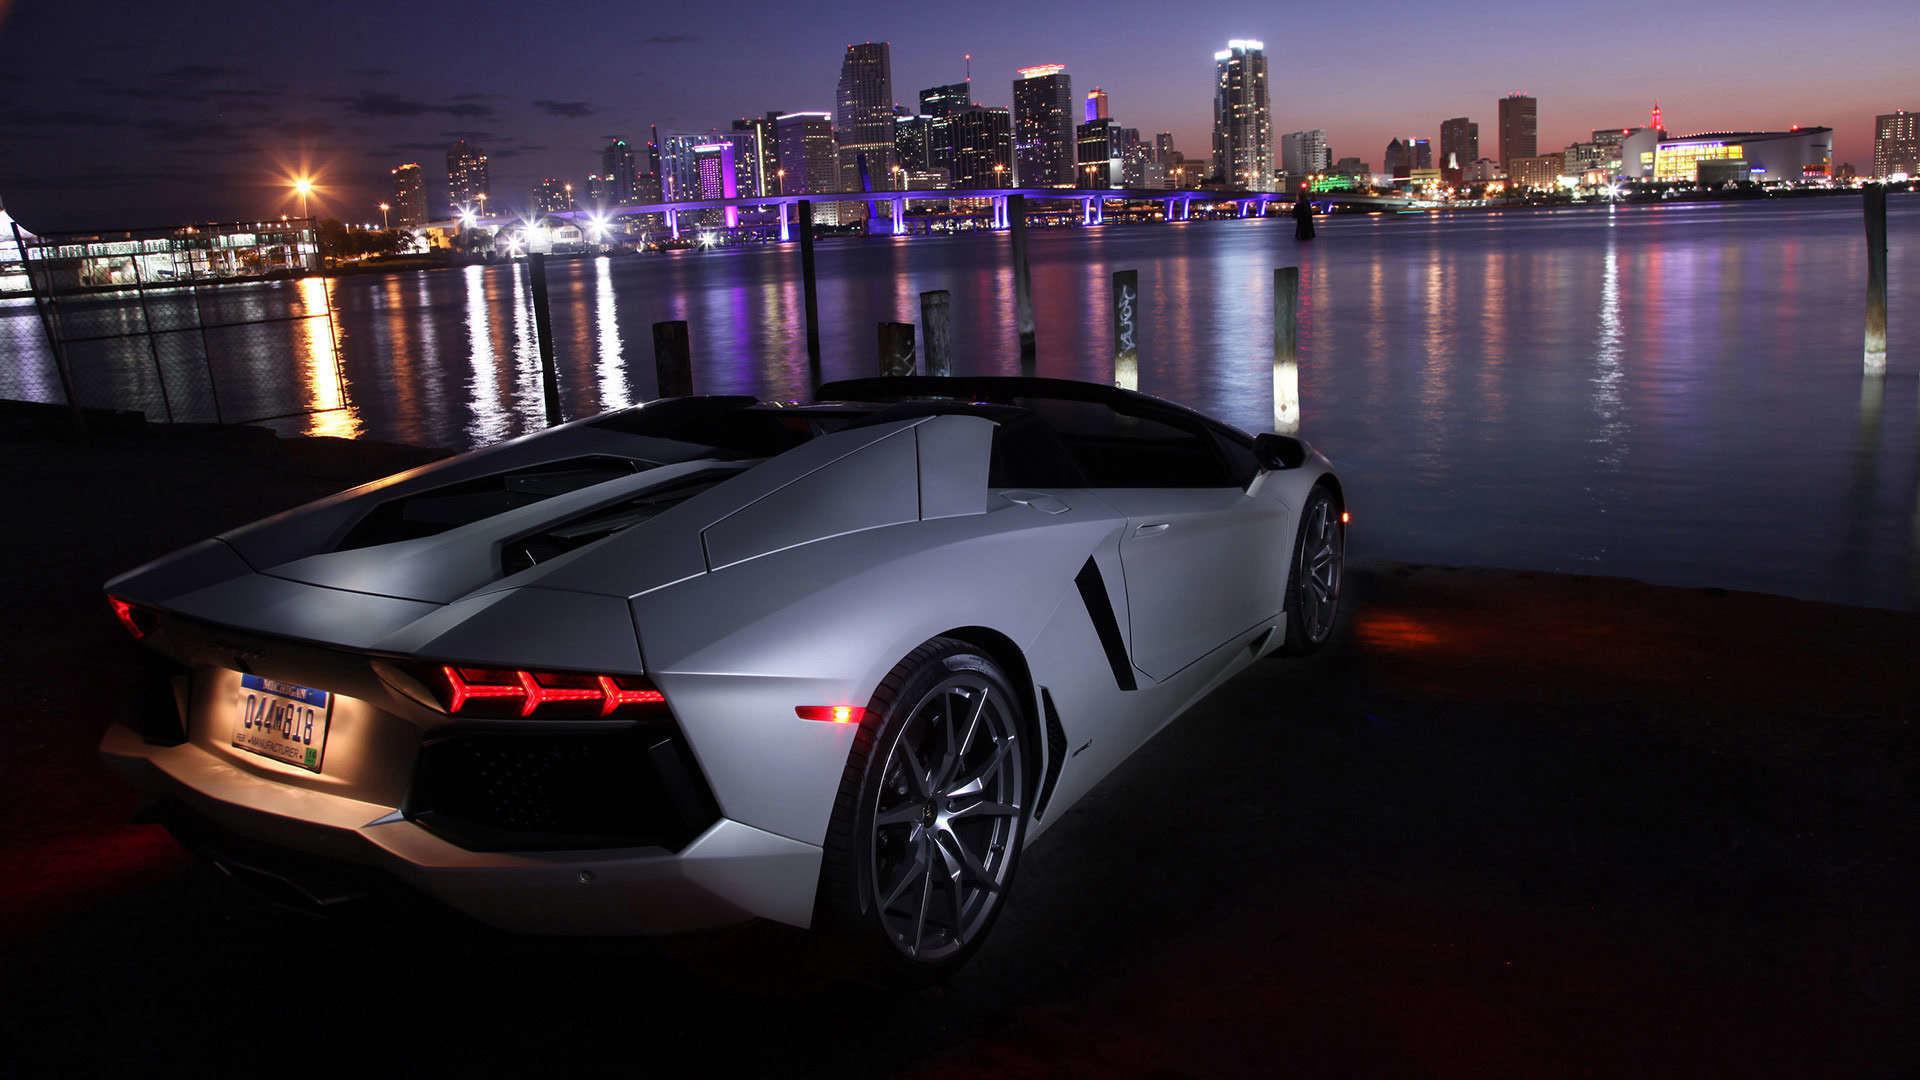 Lamborghini Wallpaper 1920x1080 72 Images